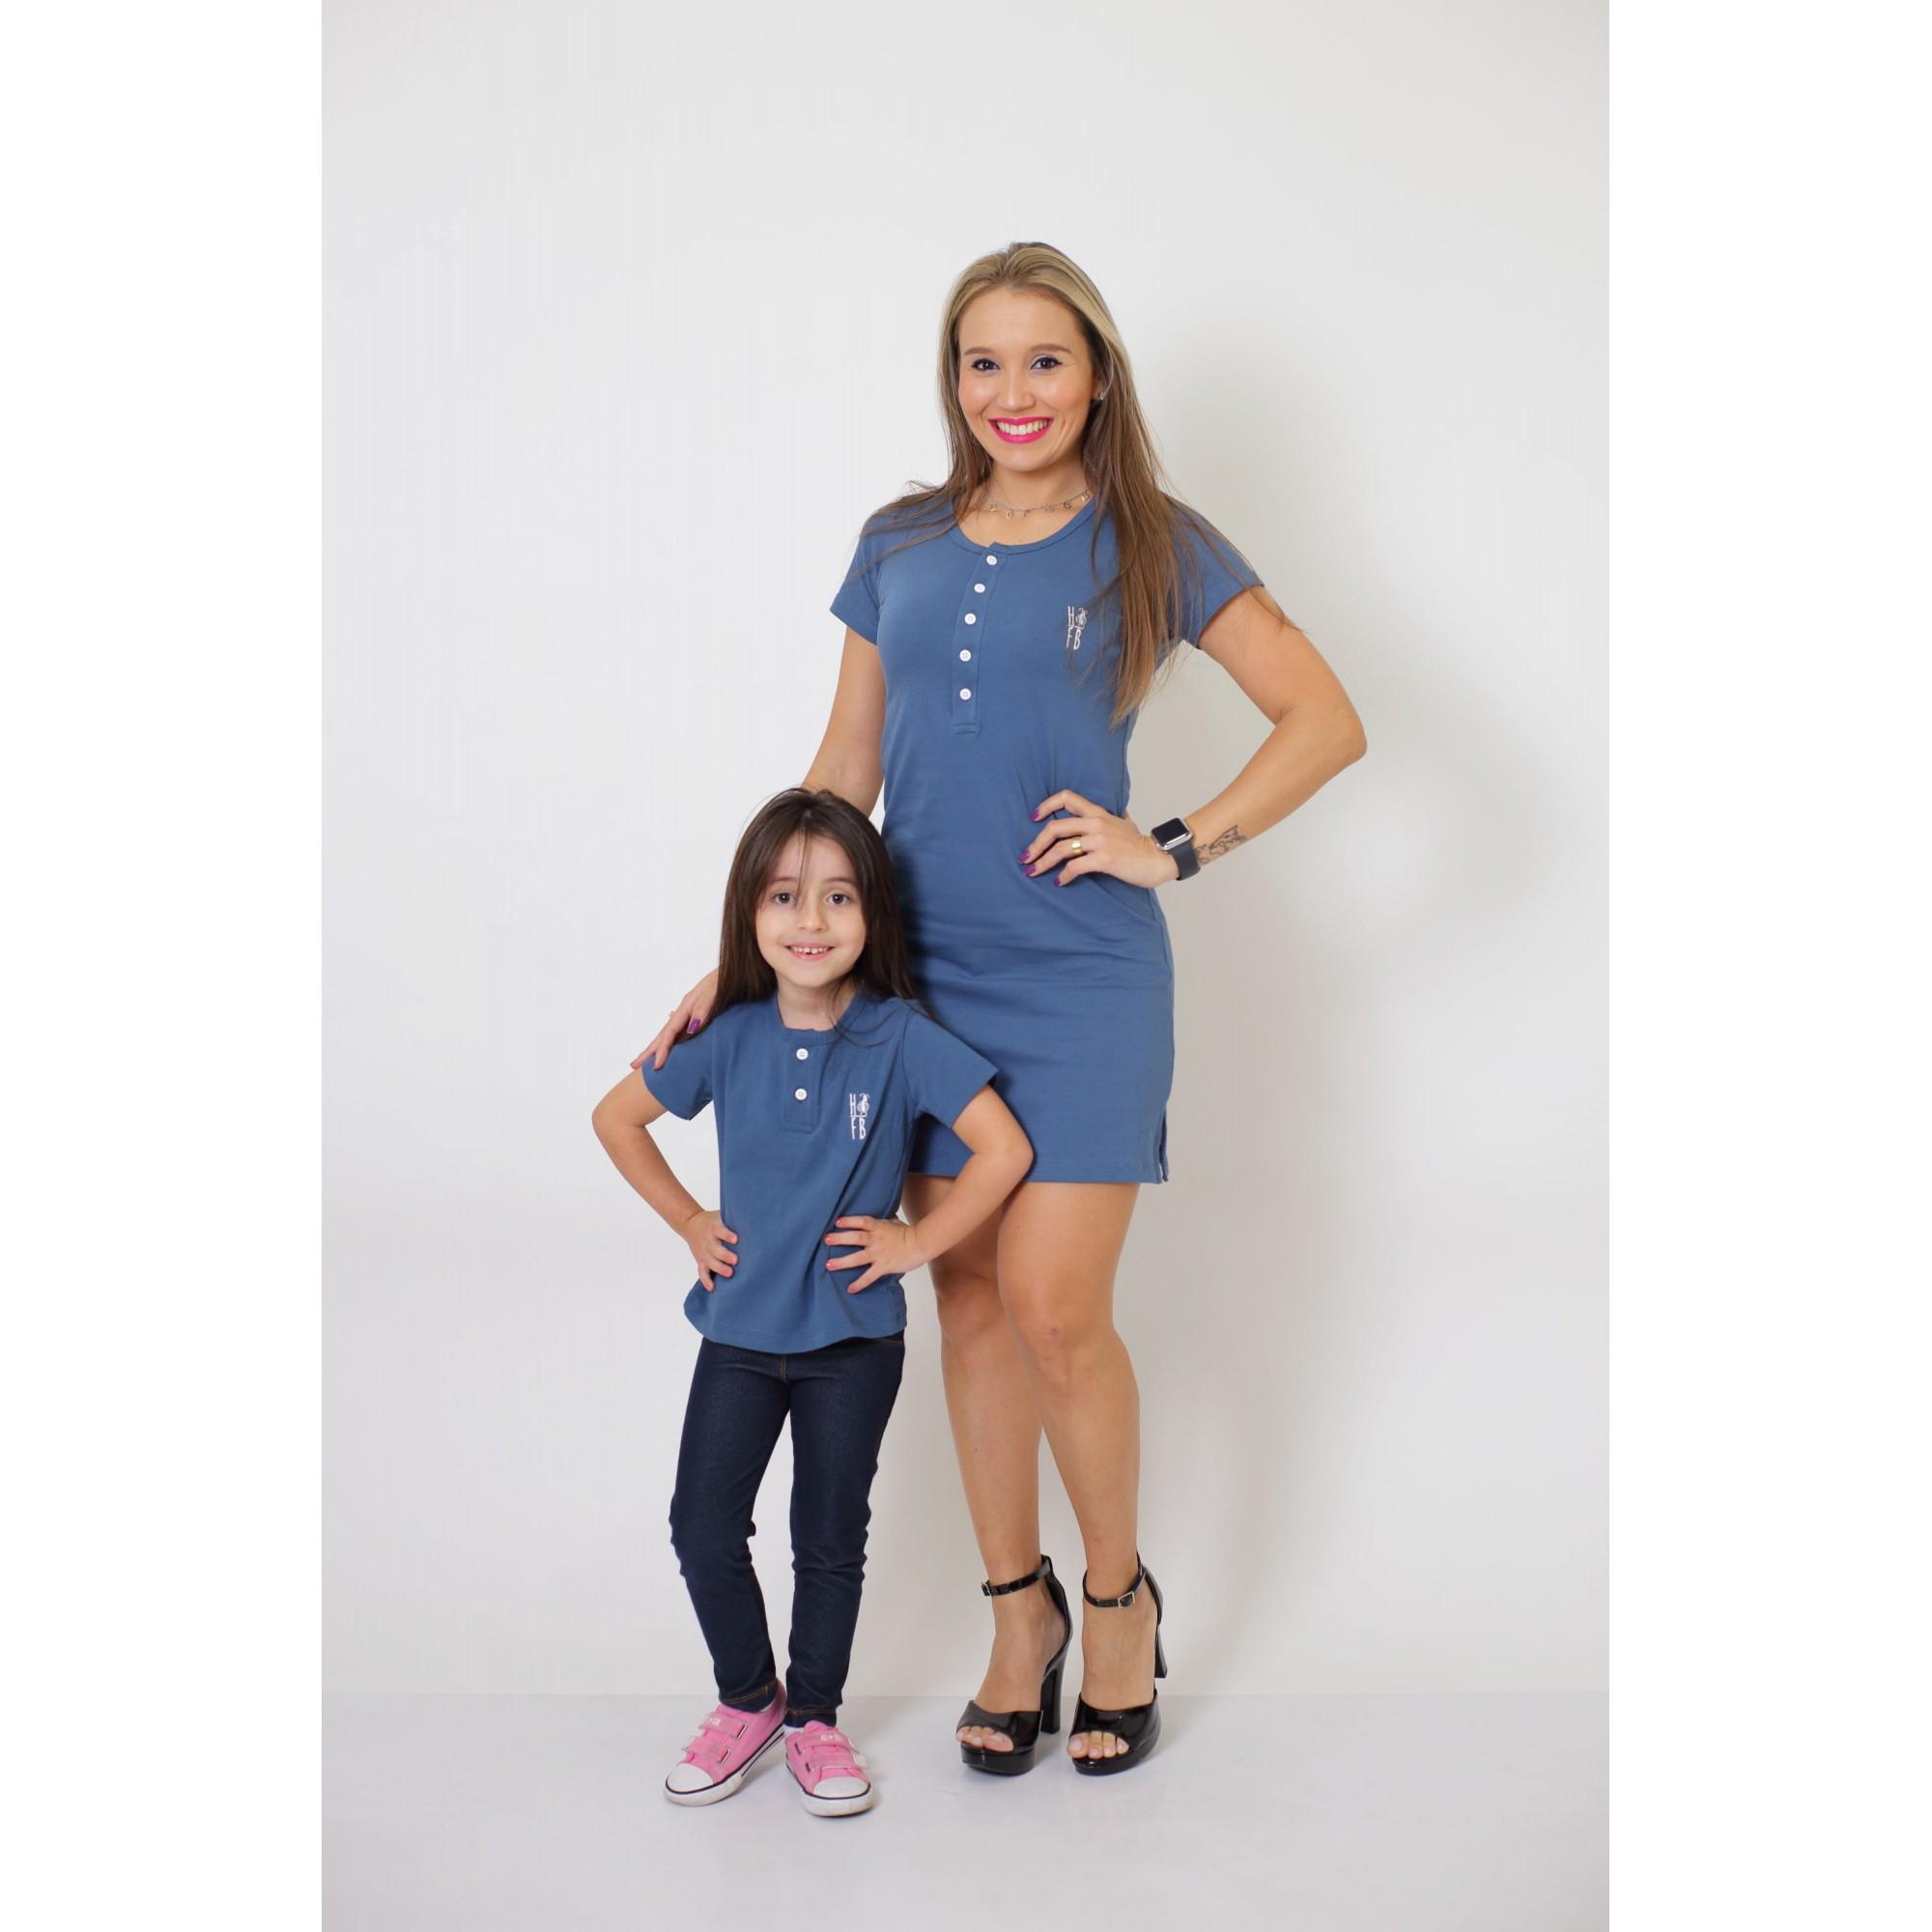 MÃE E FILHA > Kit Vestido + T-shirt Unissex ou Body Infantil - Henley - Azul Petróleo [Coleção Tal Mãe Tal Filha]